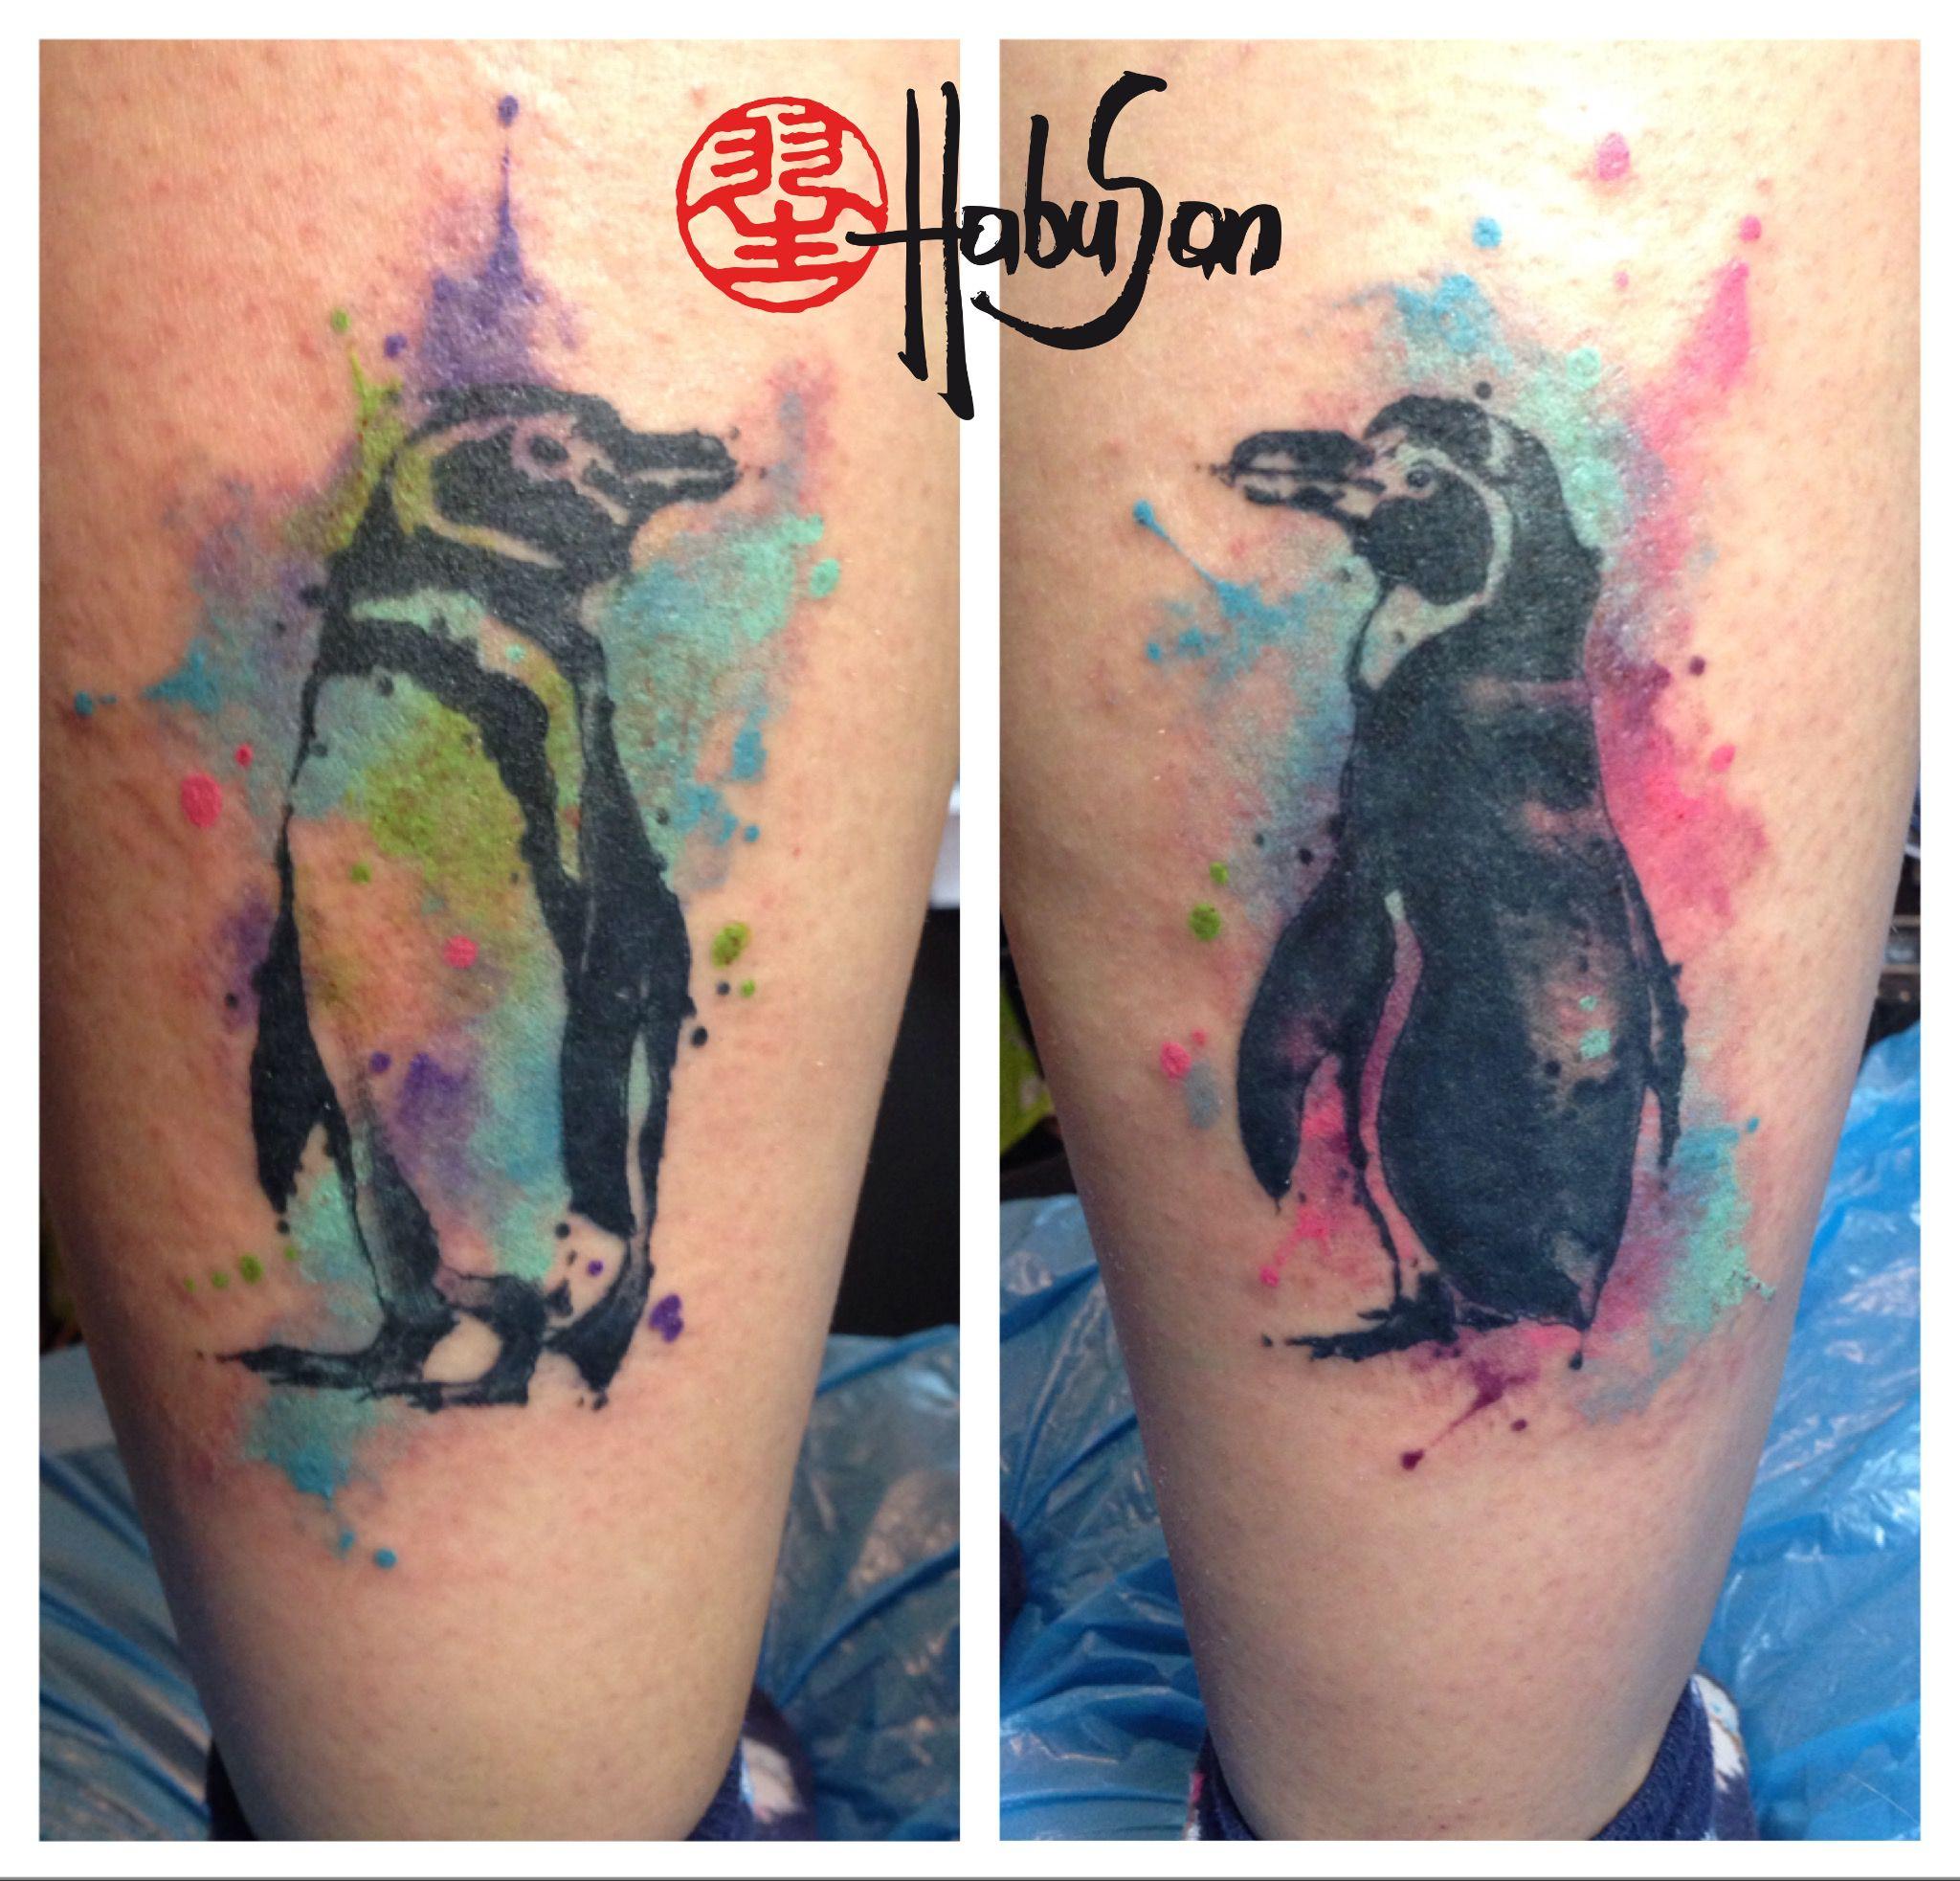 Happy feet sozusagen :-) Zwei Watercolour Pinguine auf Katrins Wadeln! Danke! #tattoo #habusan #Wien #watercolour